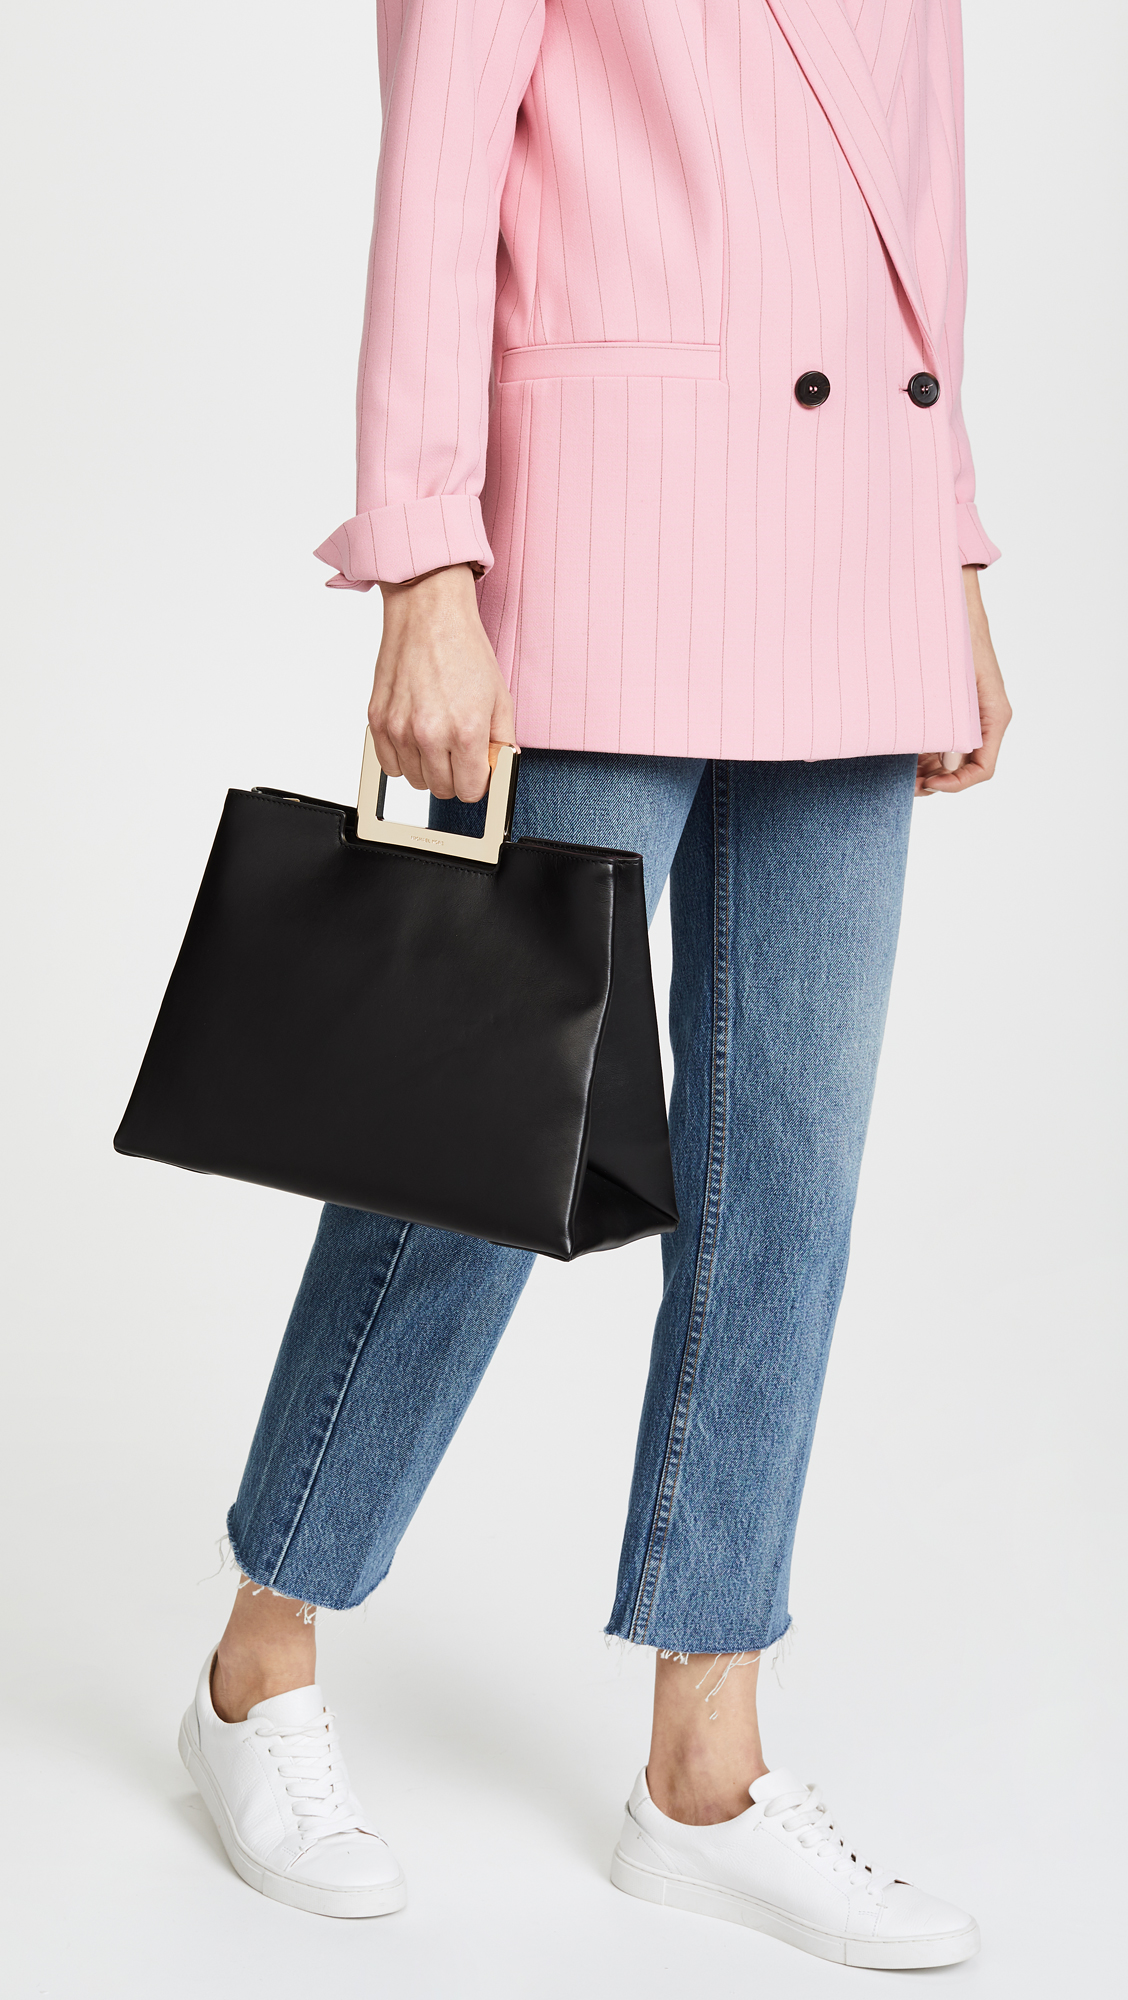 Kristen Large Top Handle Satchel Bag in Black Polished Leather Michael Michael Kors eOt8fHhhkb